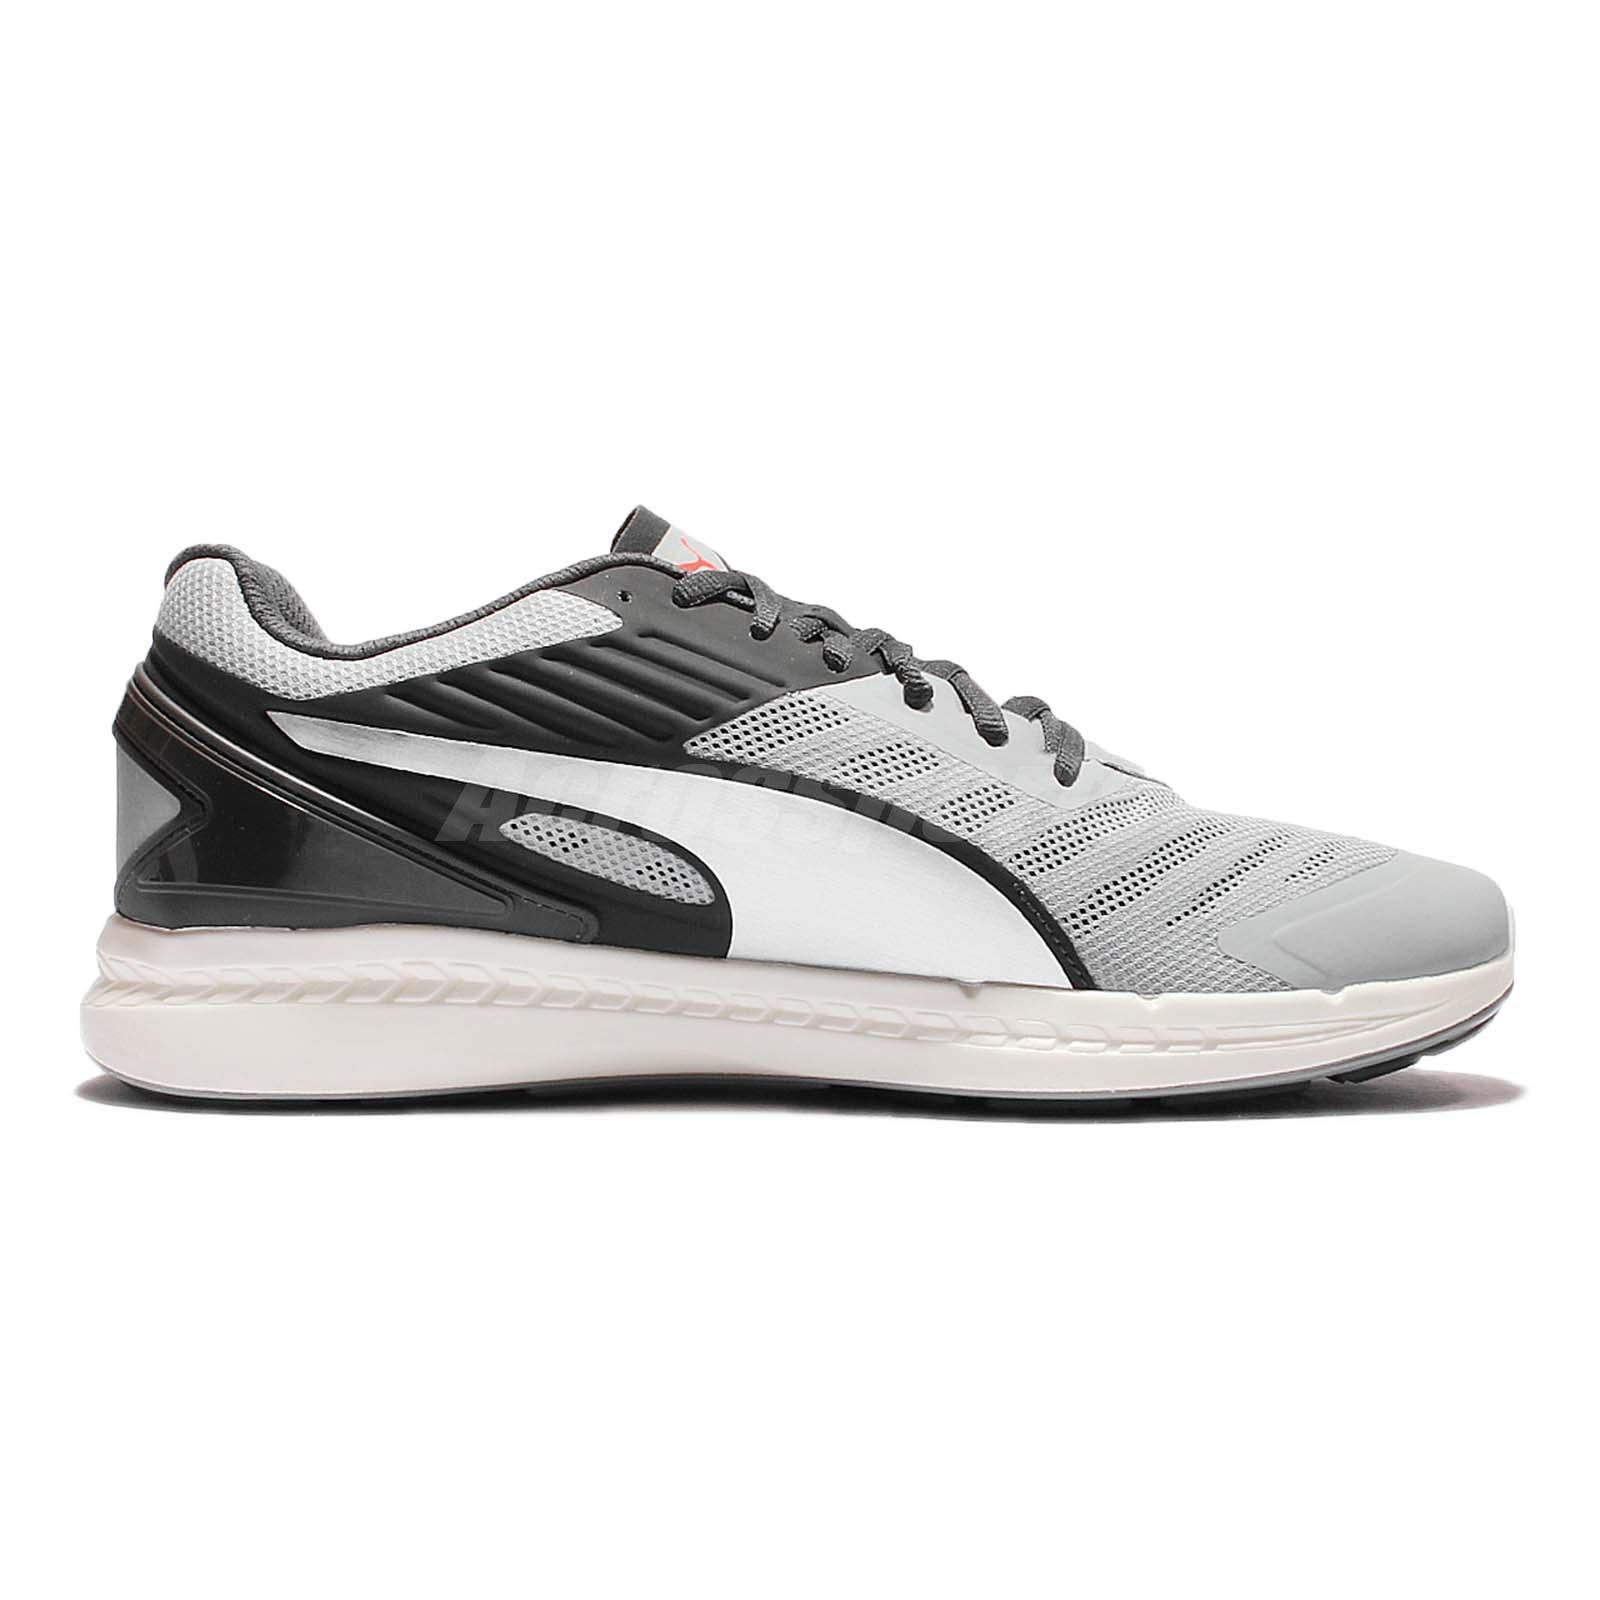 230ba1f71cee Puma Ignite V2 Silver Black Mens Cushion Running Shoes Sneakers ...